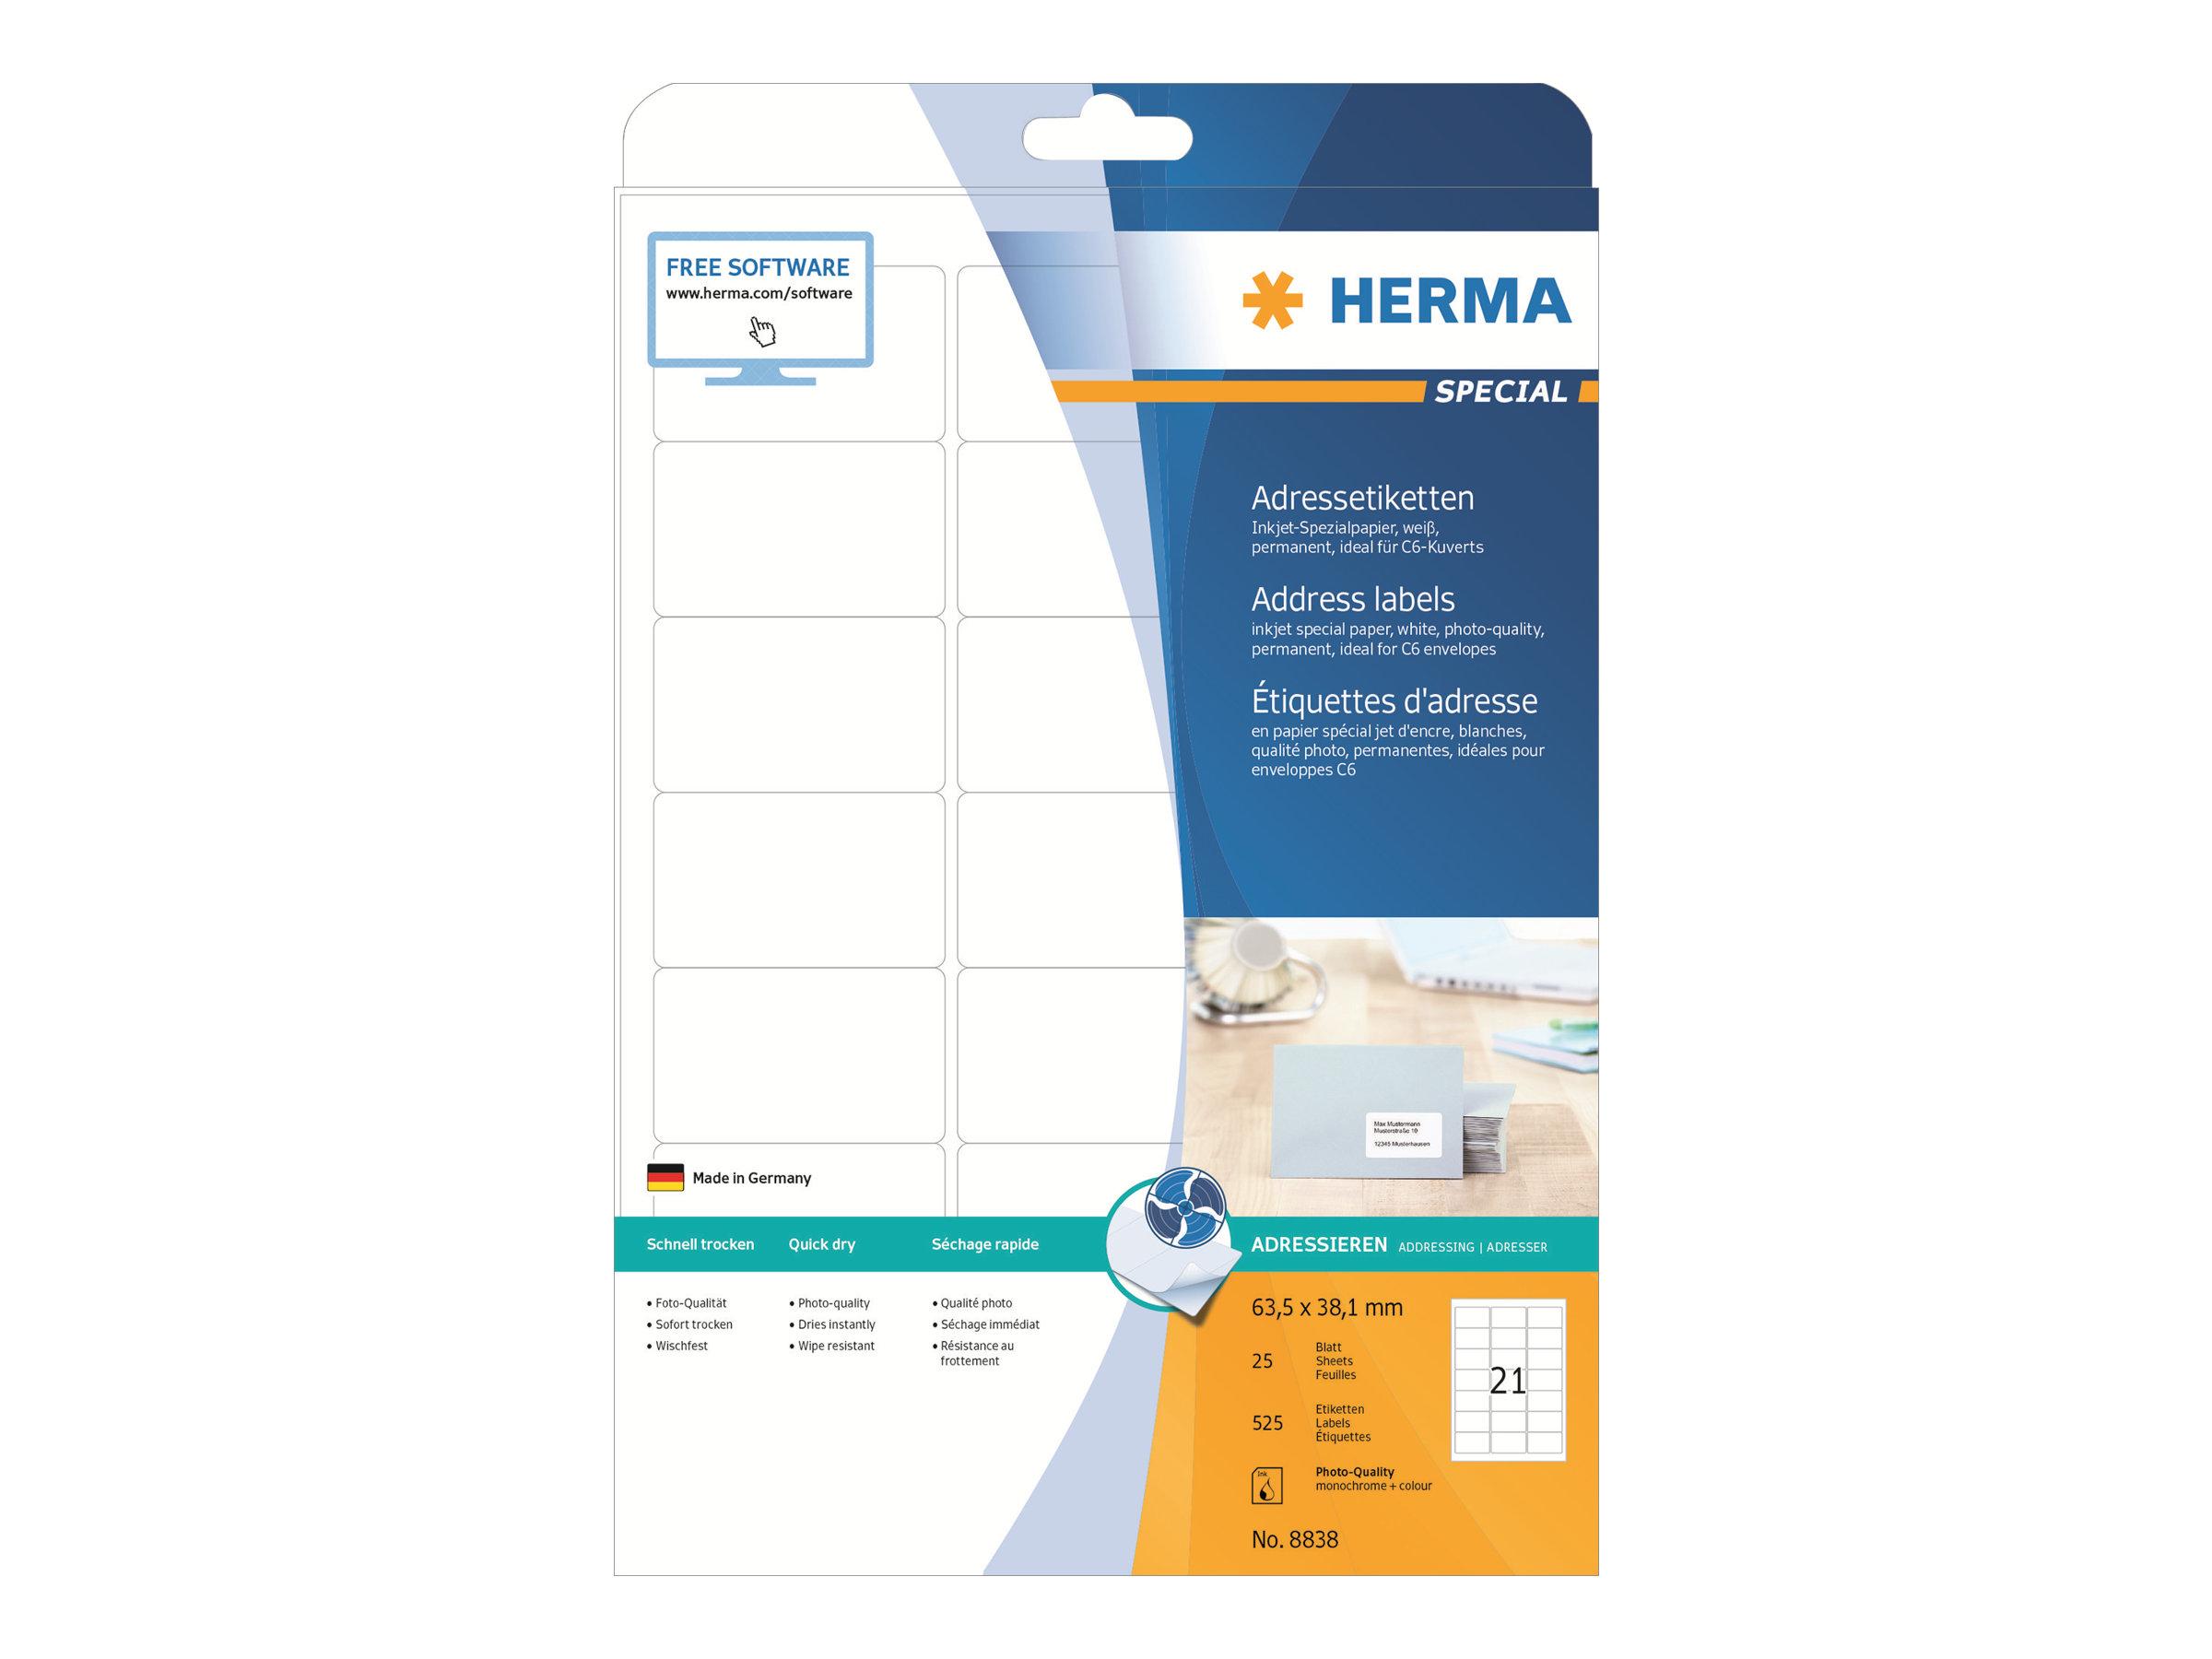 HERMA Special - Papier - matt - permanent selbstklebend - beschichtet - weiß - 63.5 x 38.1 mm - 90 g/m² - 525 Etikett(en) (25 Bogen x 21)